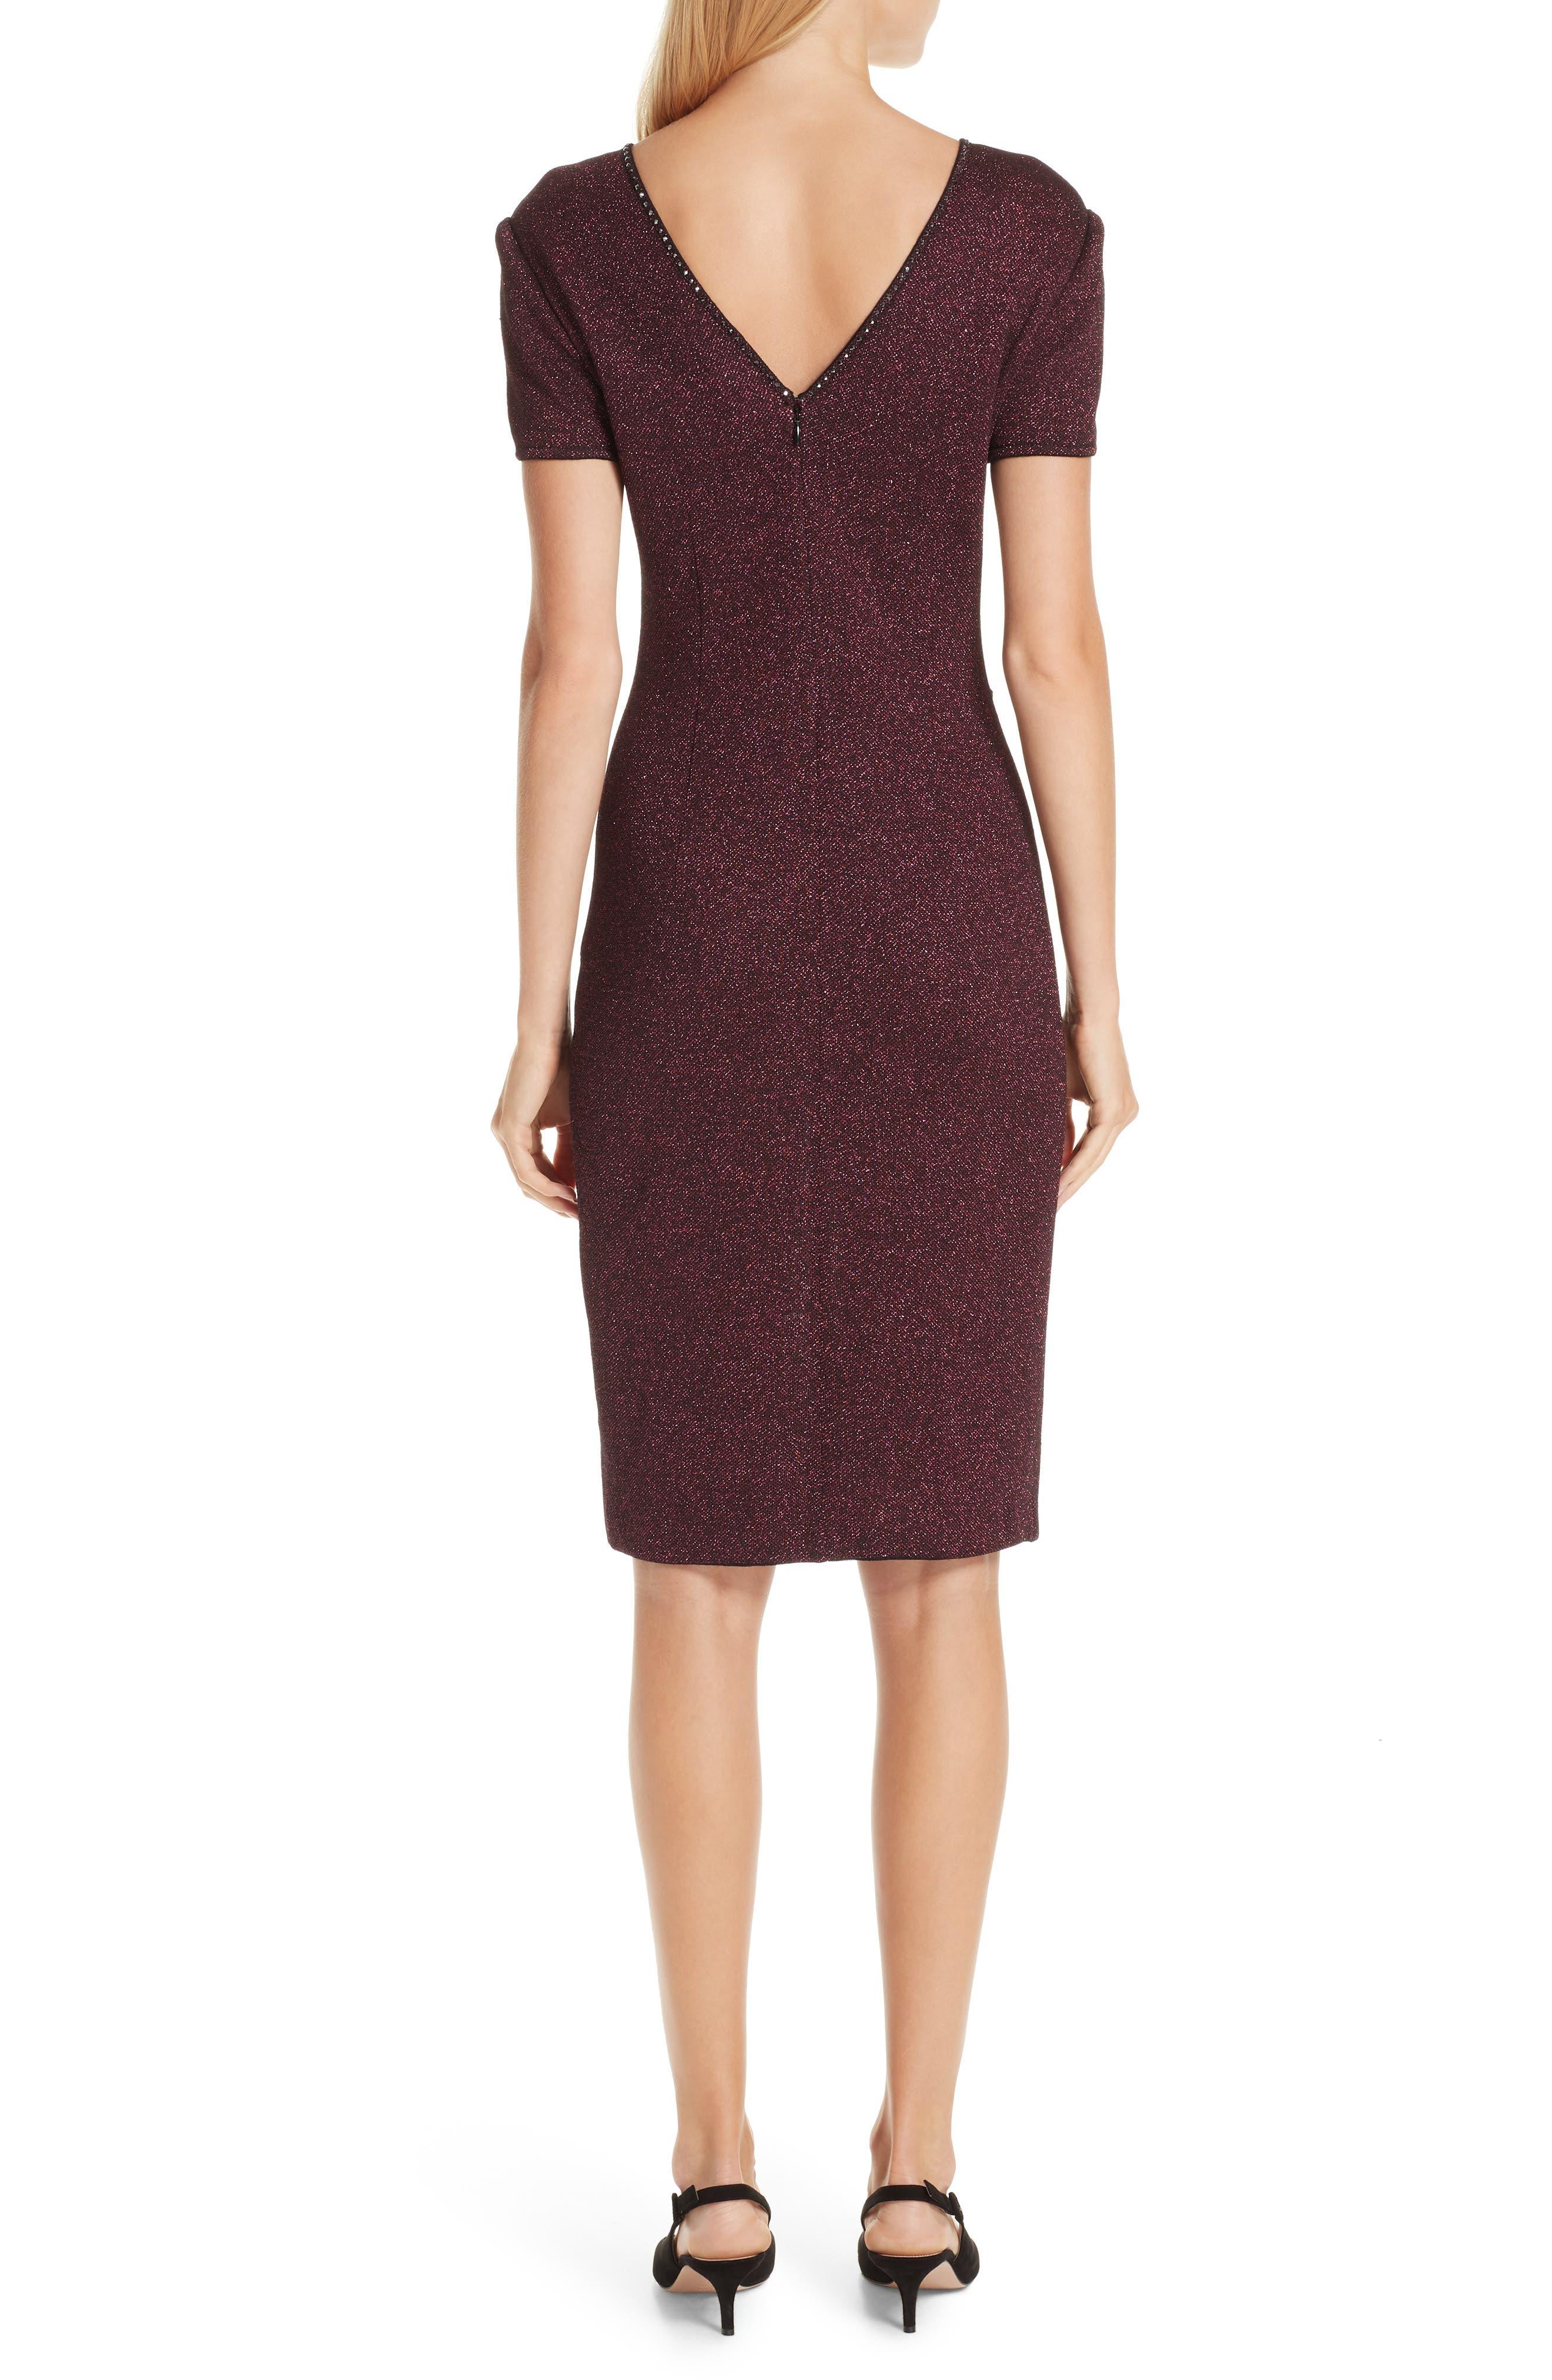 ST. JOHN COLLECTION, Mod Metallic Knit Sheath Dress, Alternate thumbnail 2, color, DARK PINK MULTI